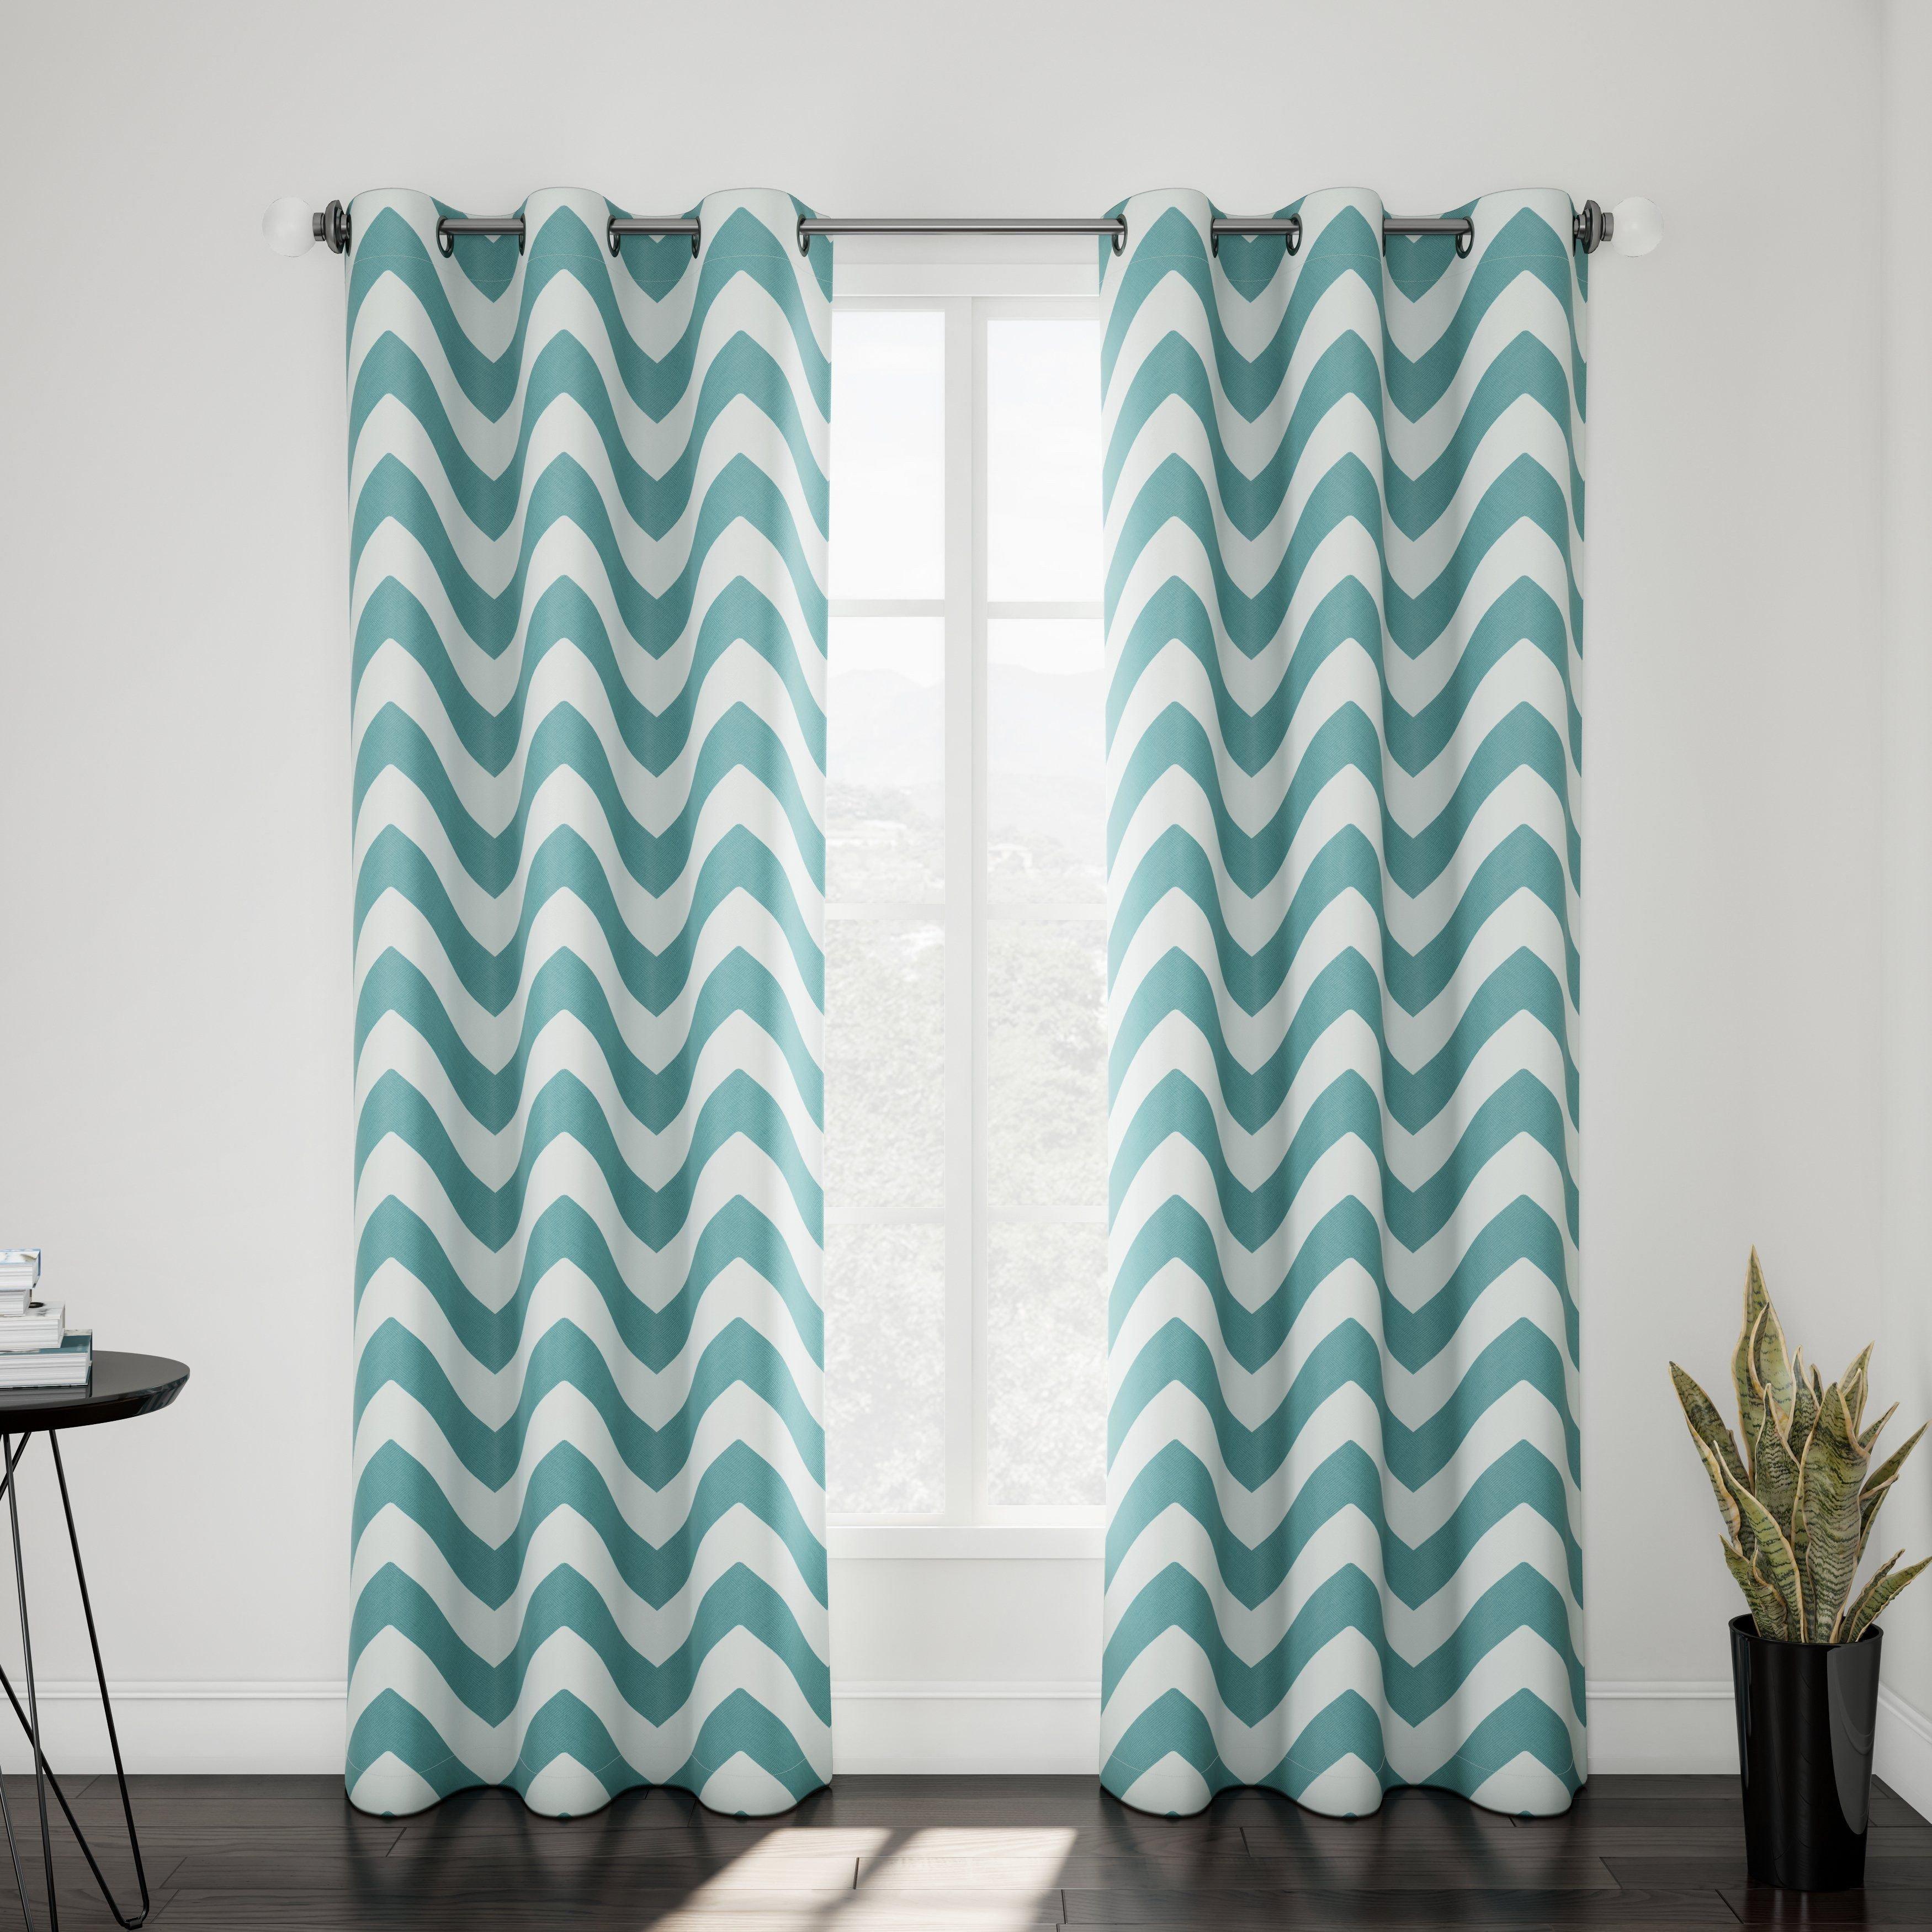 Short Curtains for Bedroom Unique Porch & Den Dooley Curtain Panel Pair 42 X 84 Grey Gray